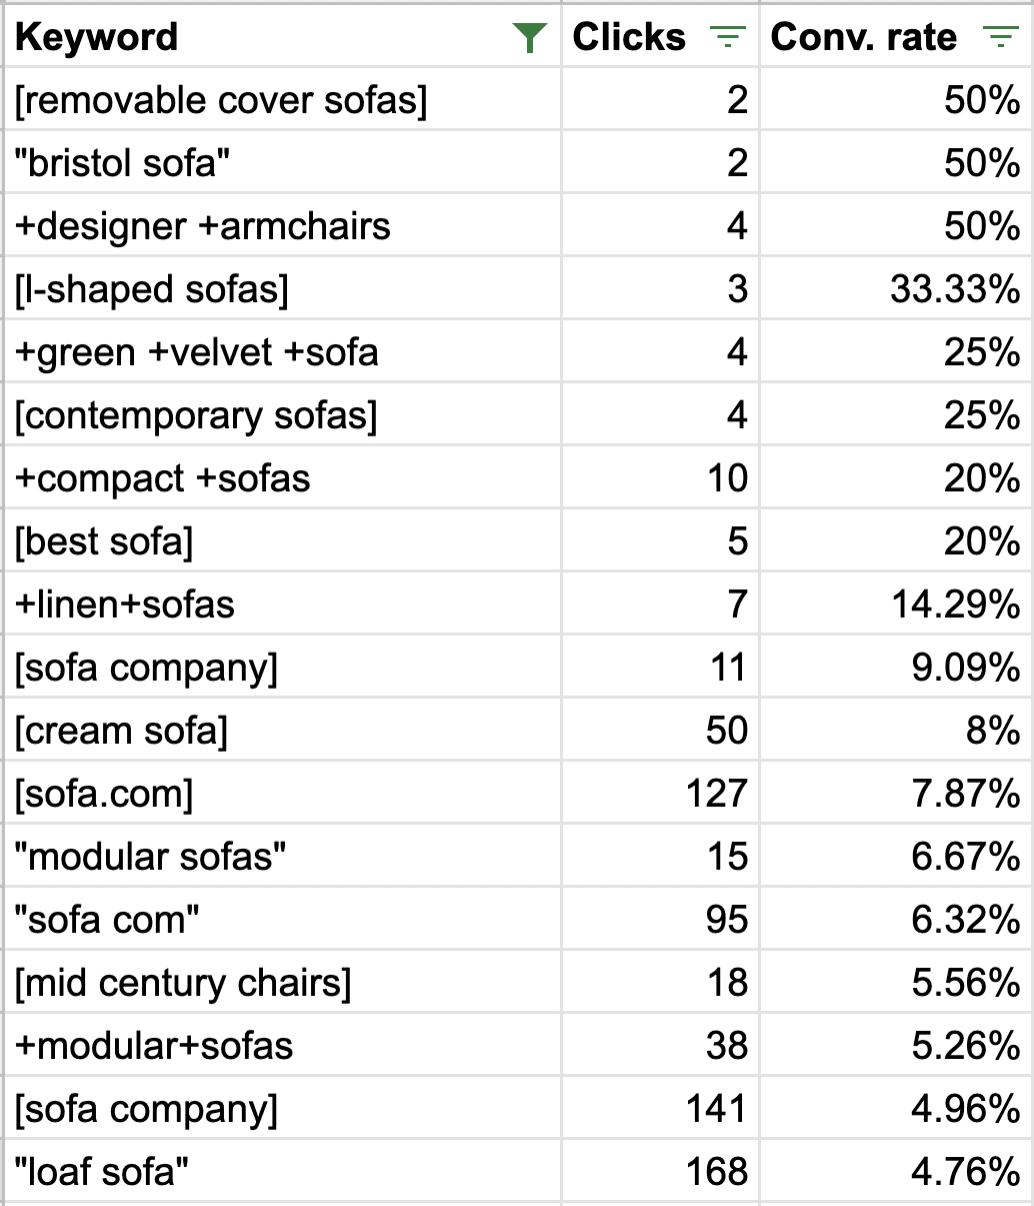 keyword conversion rate